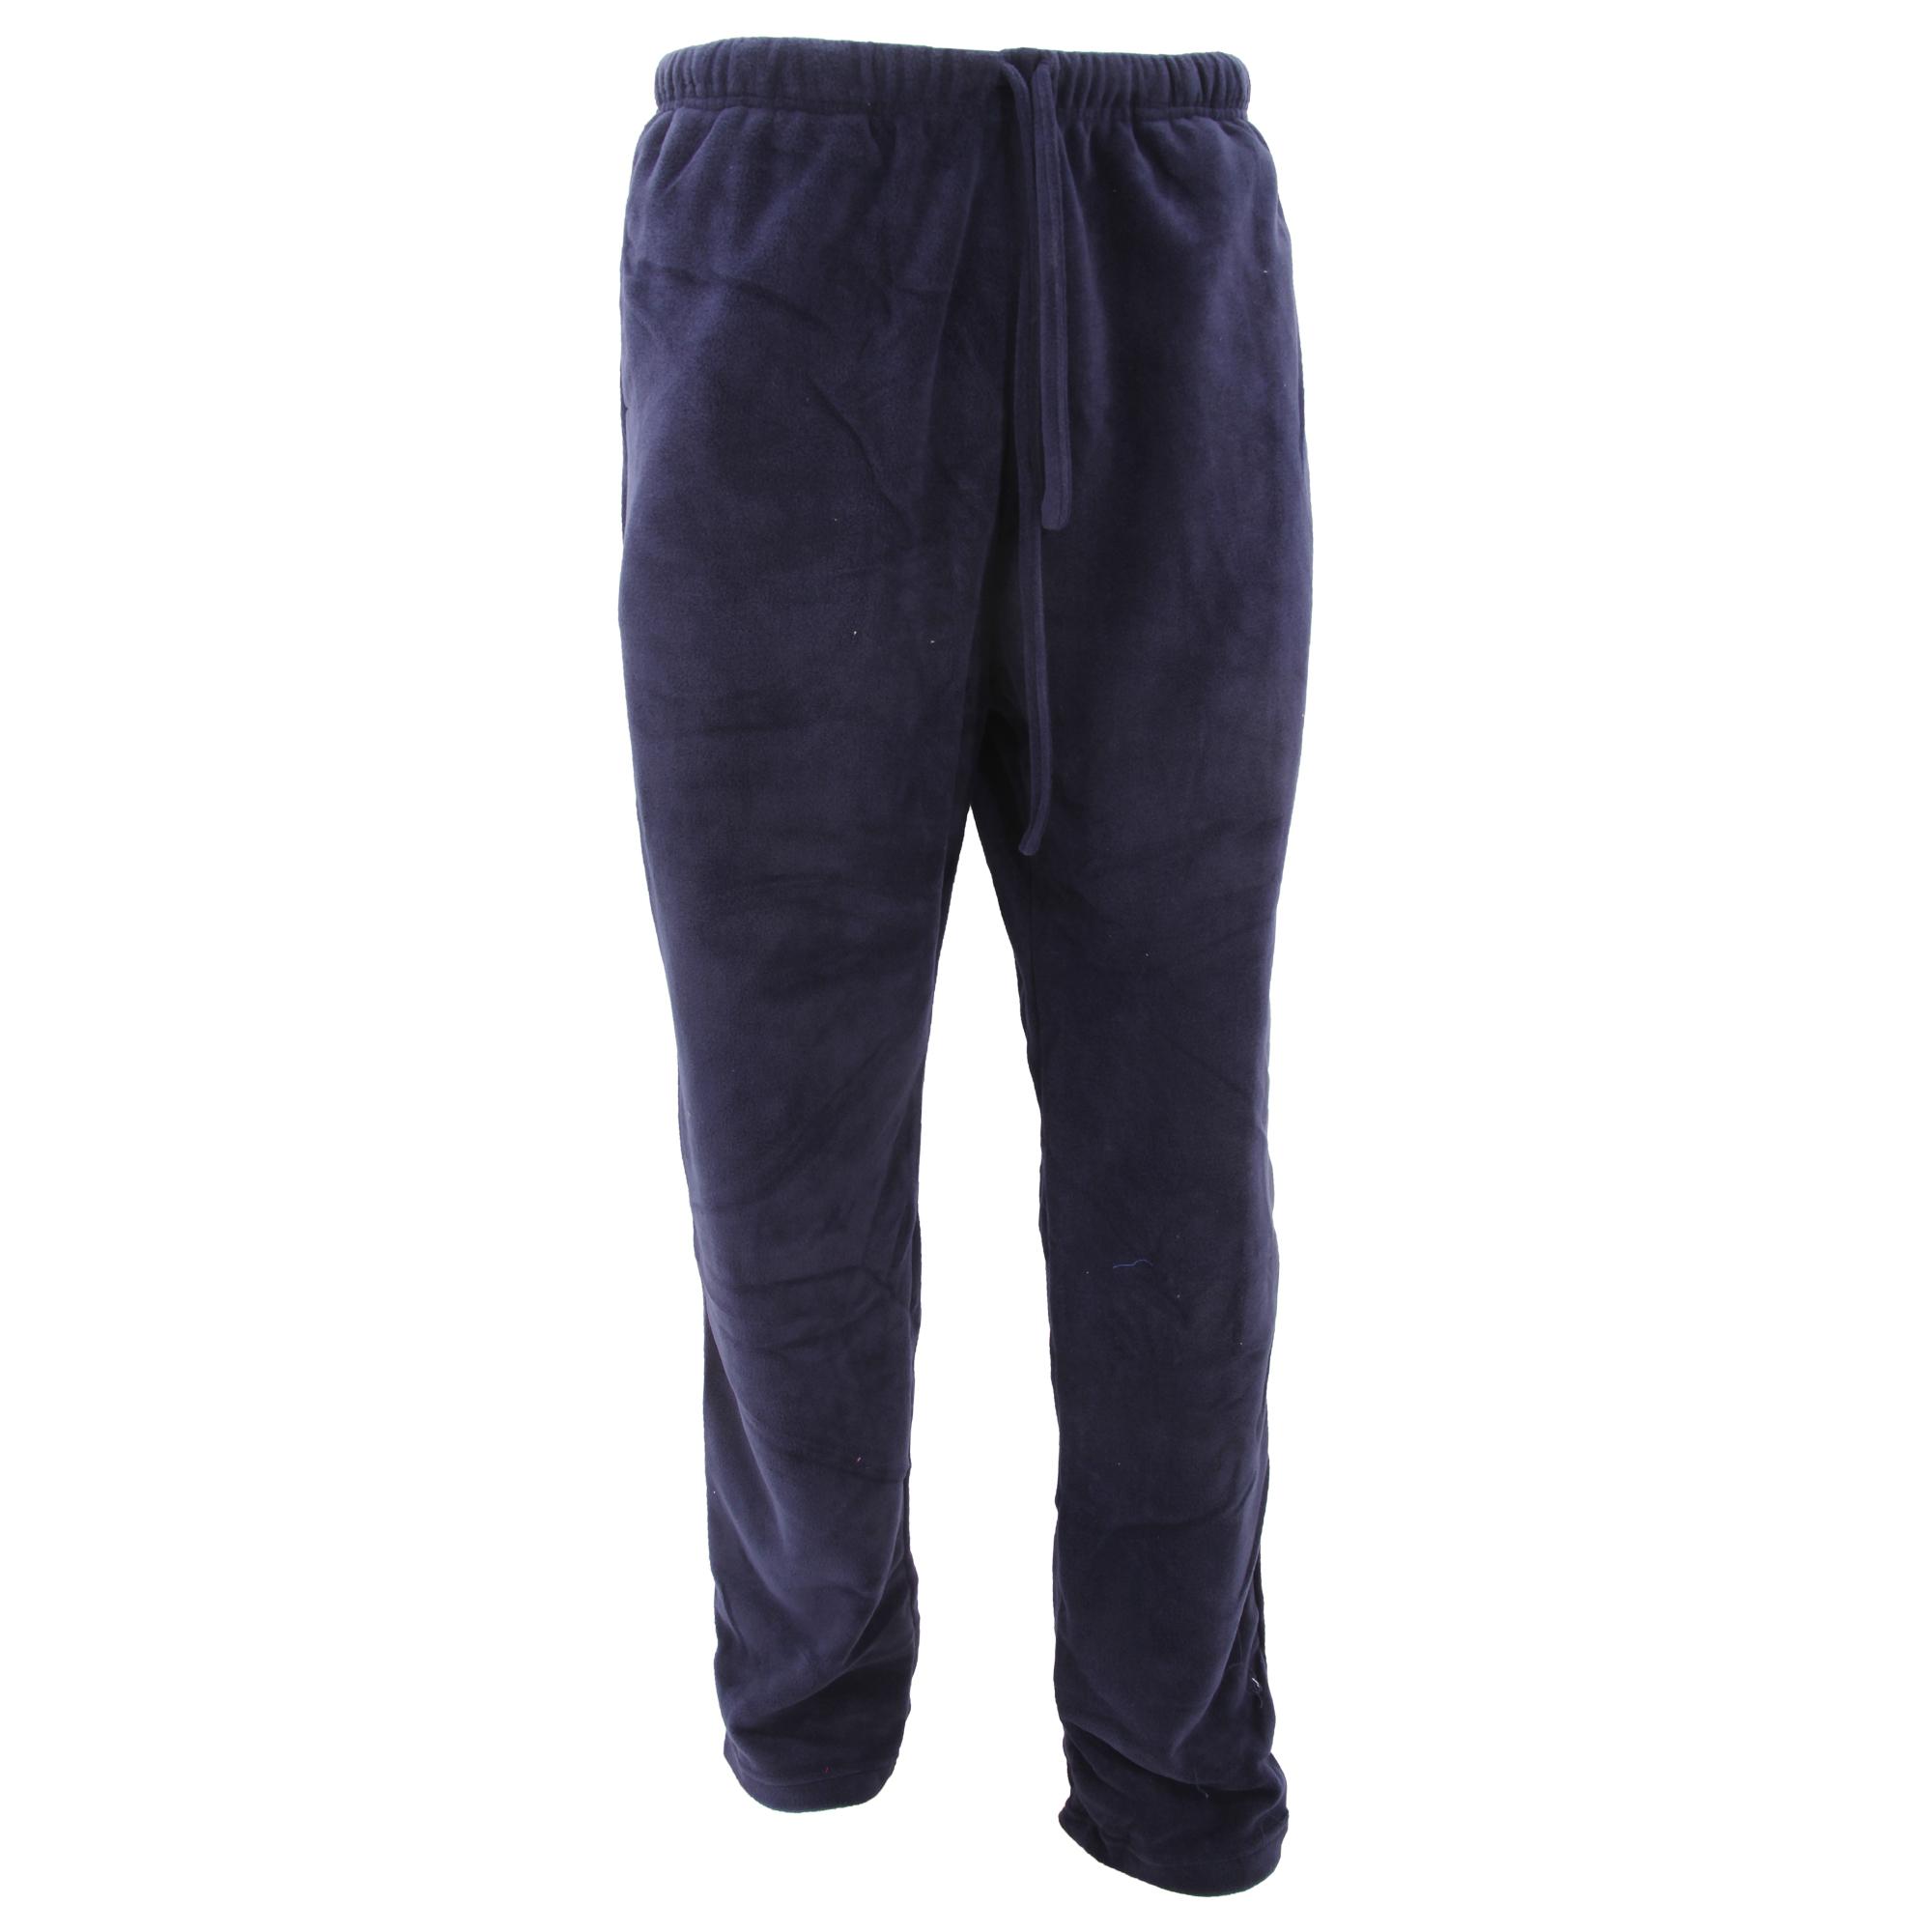 Mens Plain Fleece Pajama Bottoms/Lounge Pants